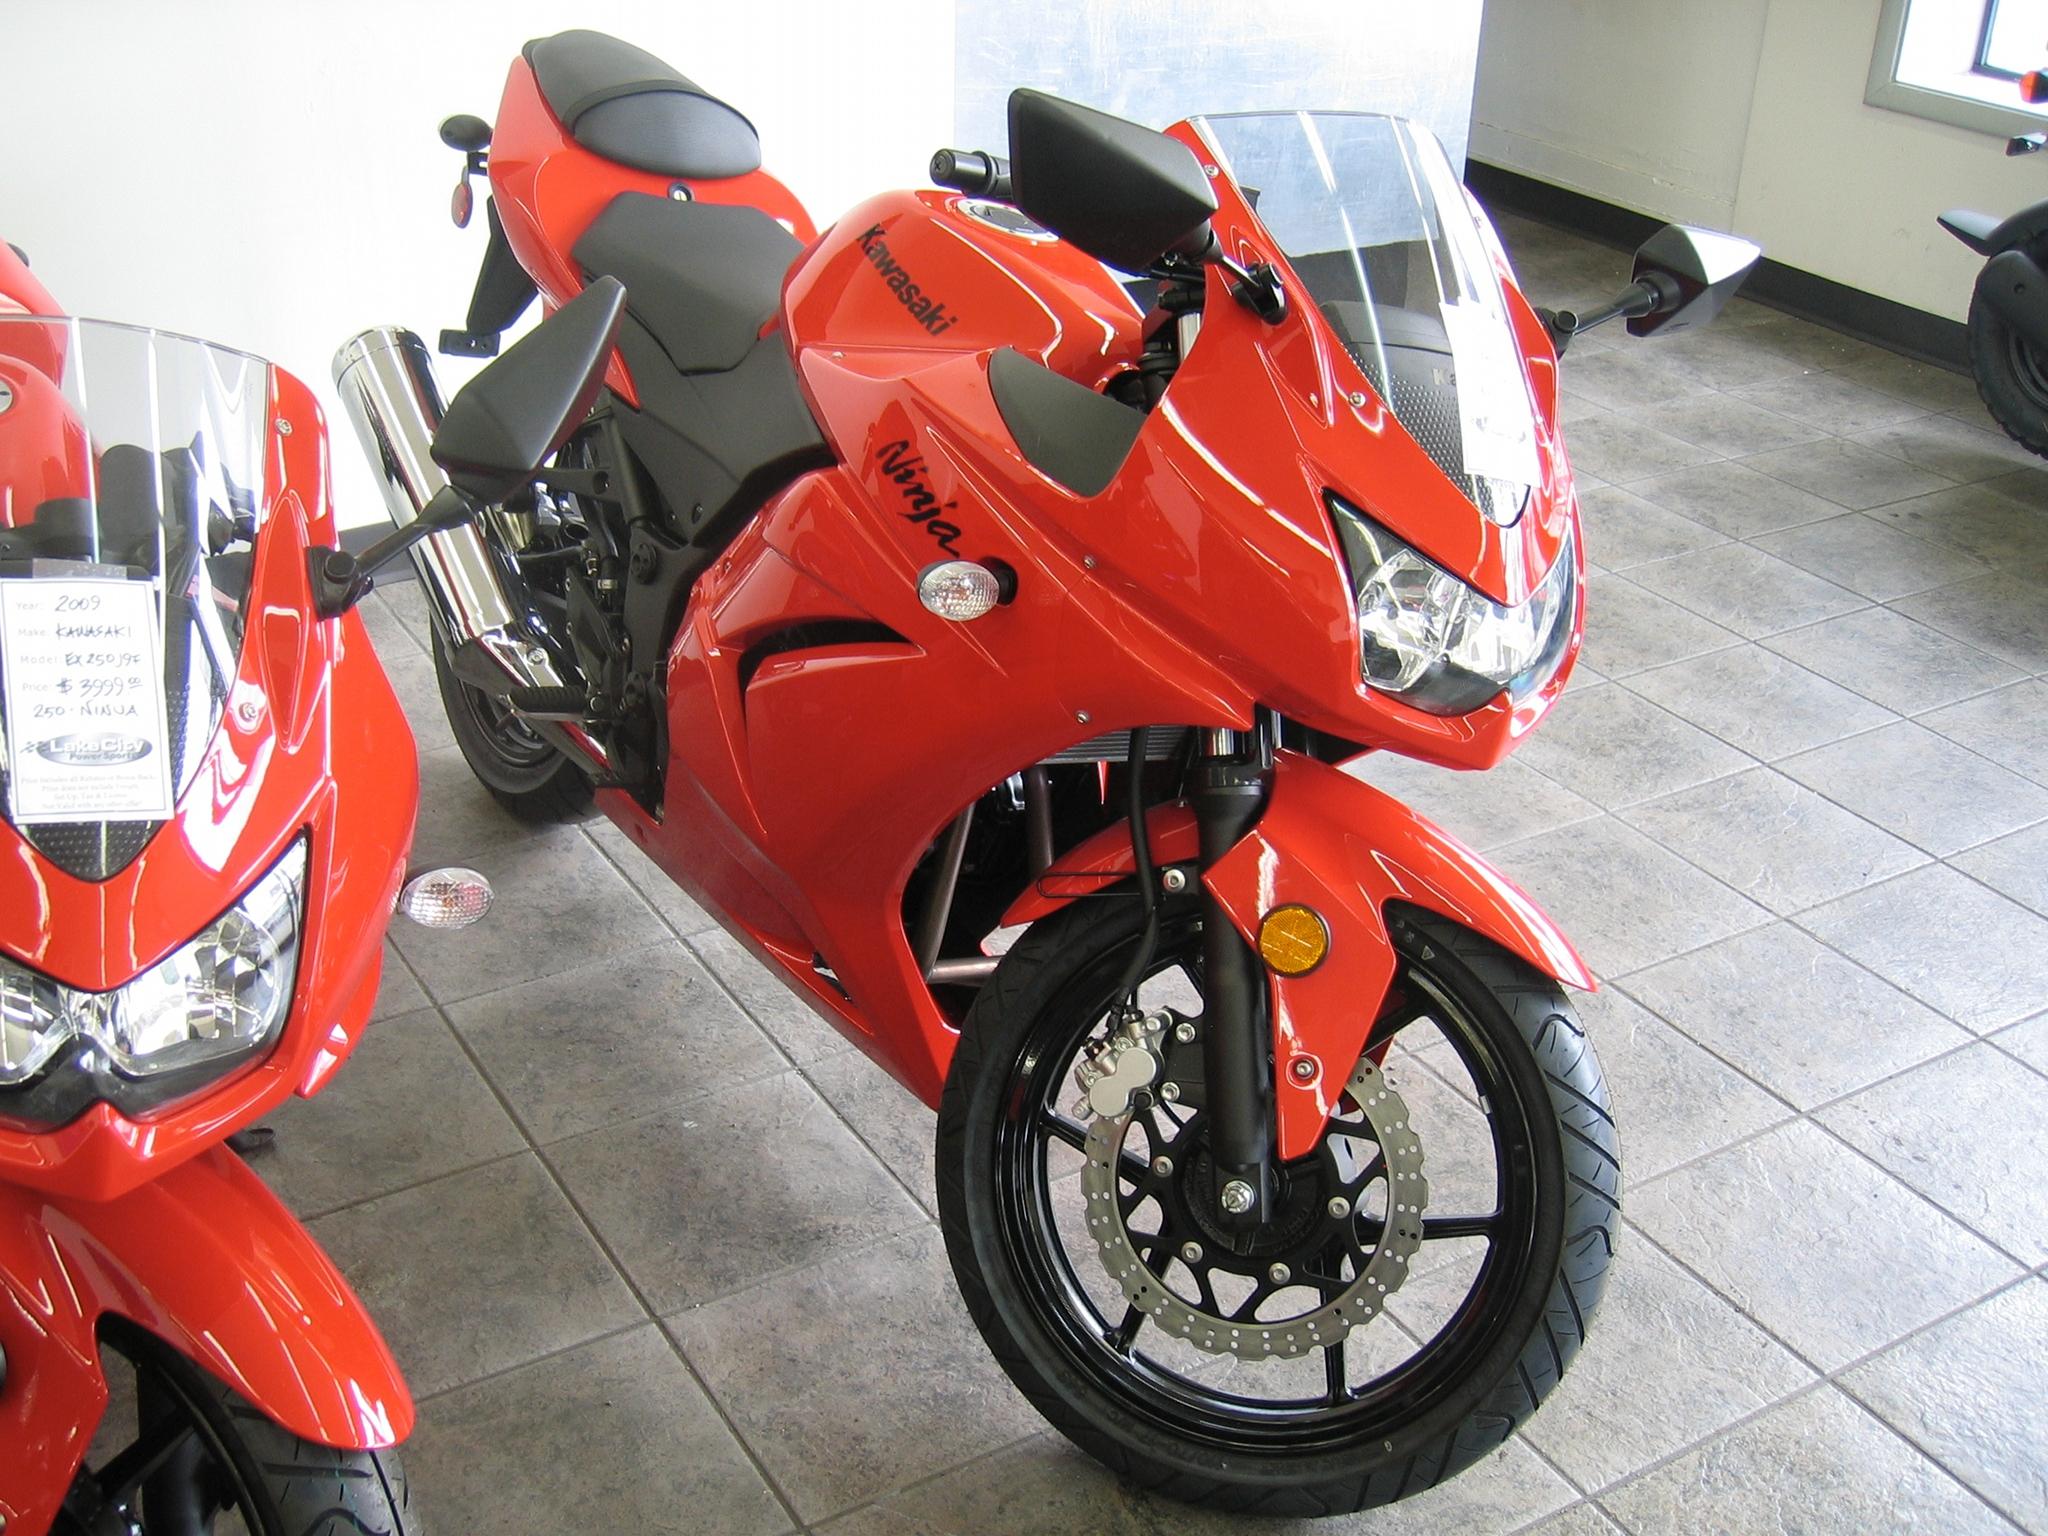 2009 Kawasaki Ninja 250 R Photo